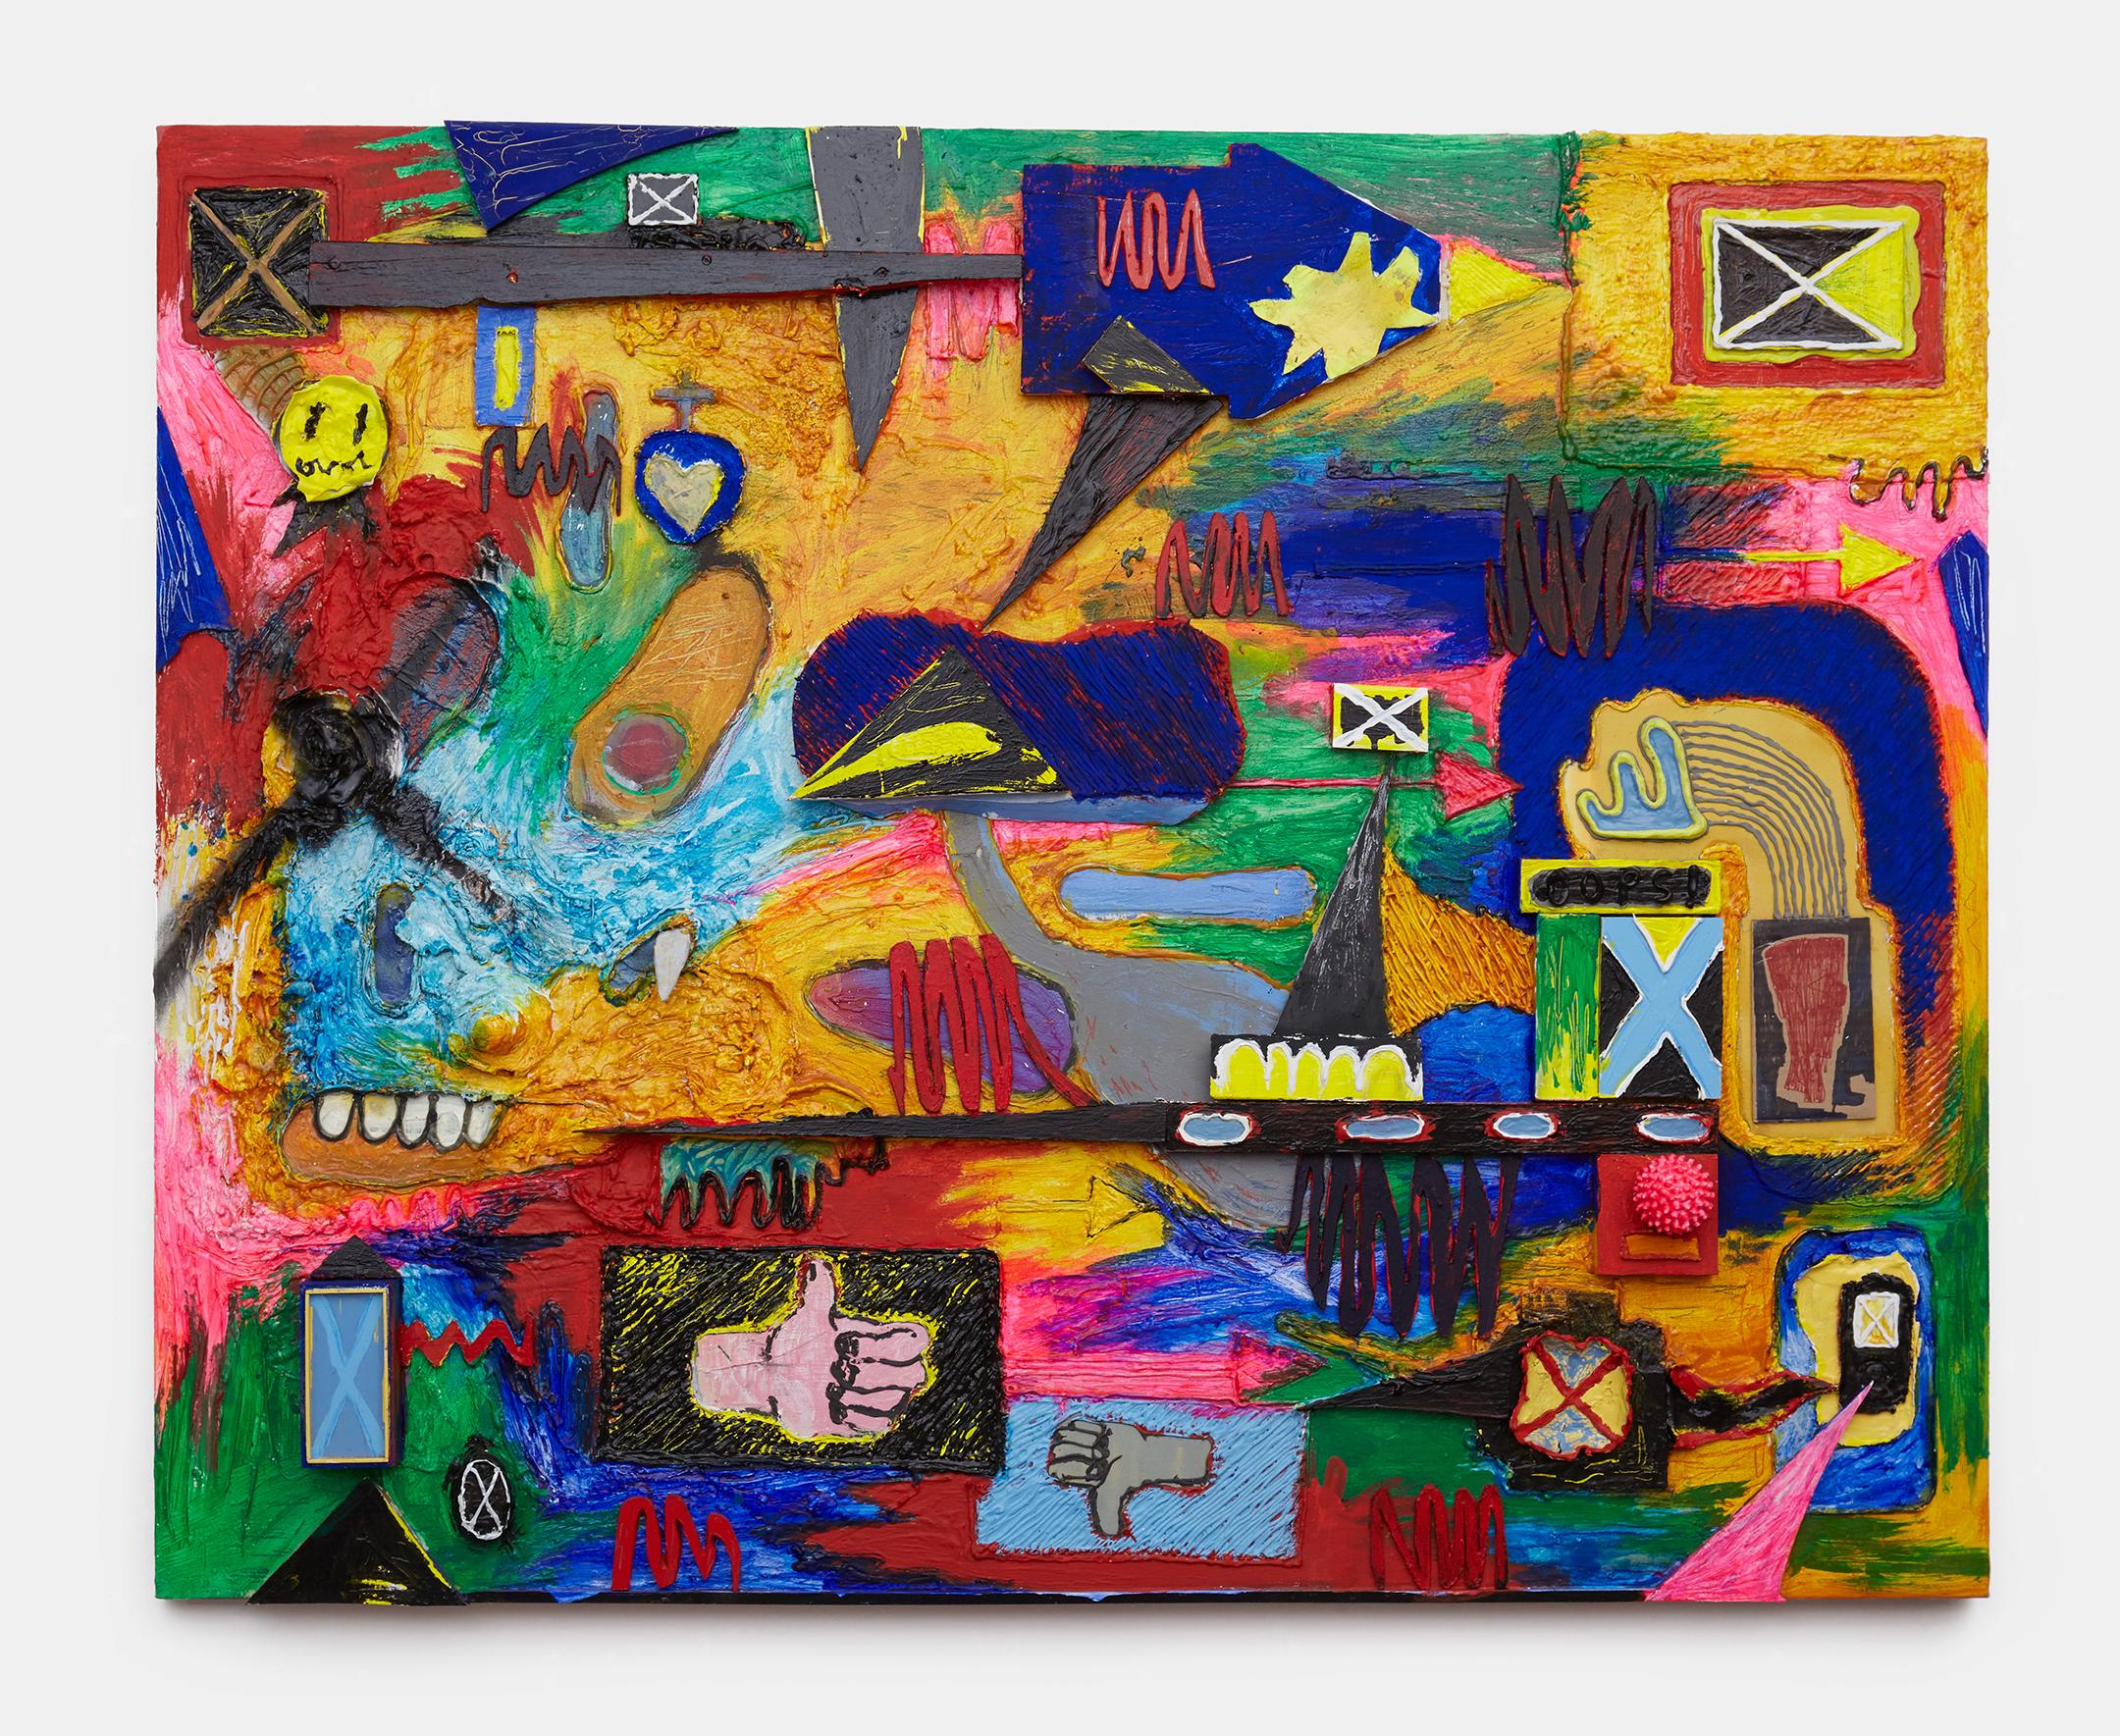 "nic rad //""oops (my mistake)"" //2016 //oil, acrylic, caulk, enamel, stone, wood, plastic, clay, on canvas mounted on board //48h x 60w in"